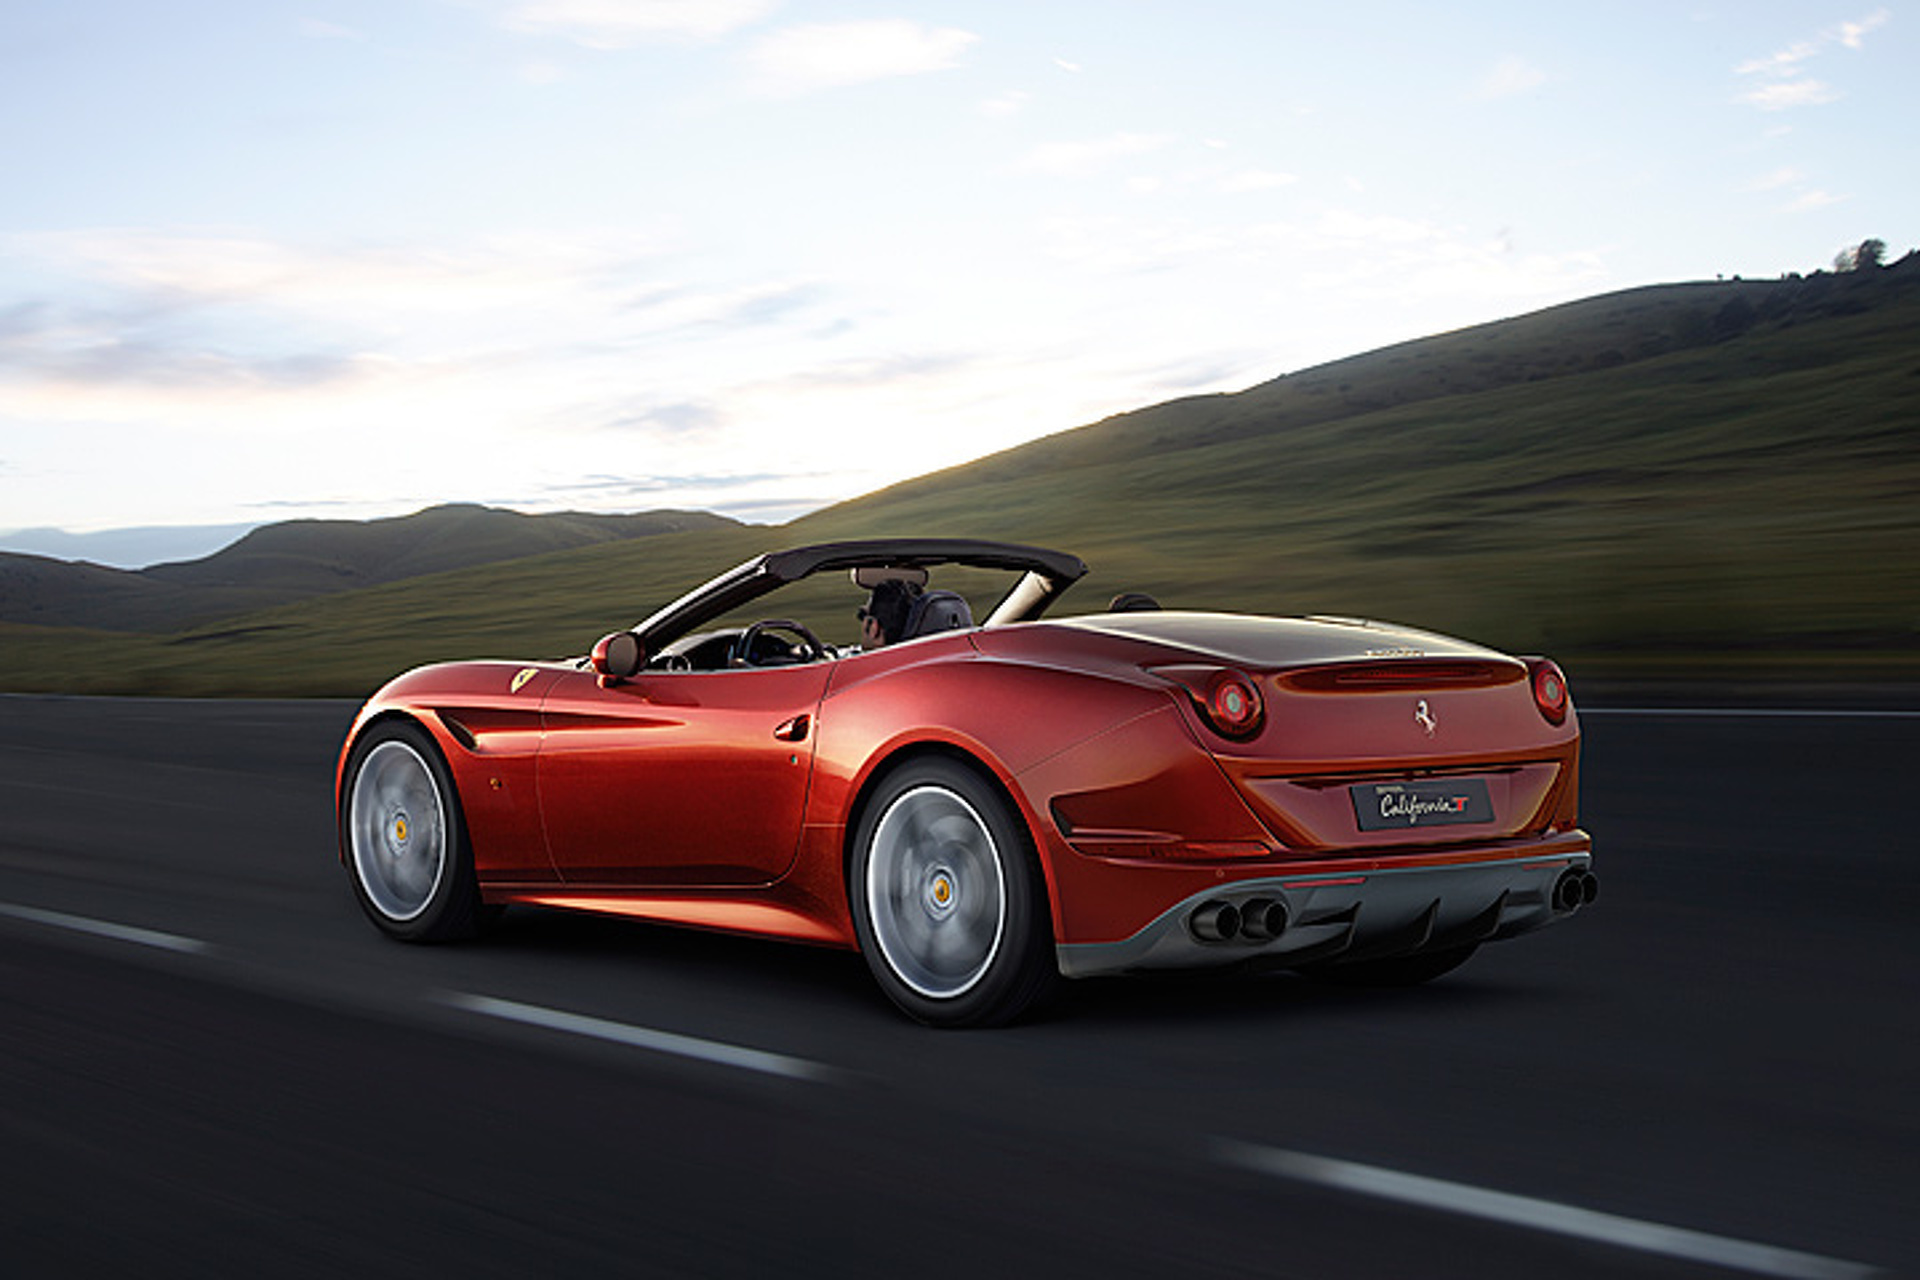 The 2016 Ferrari California T Just Got Even Sportier